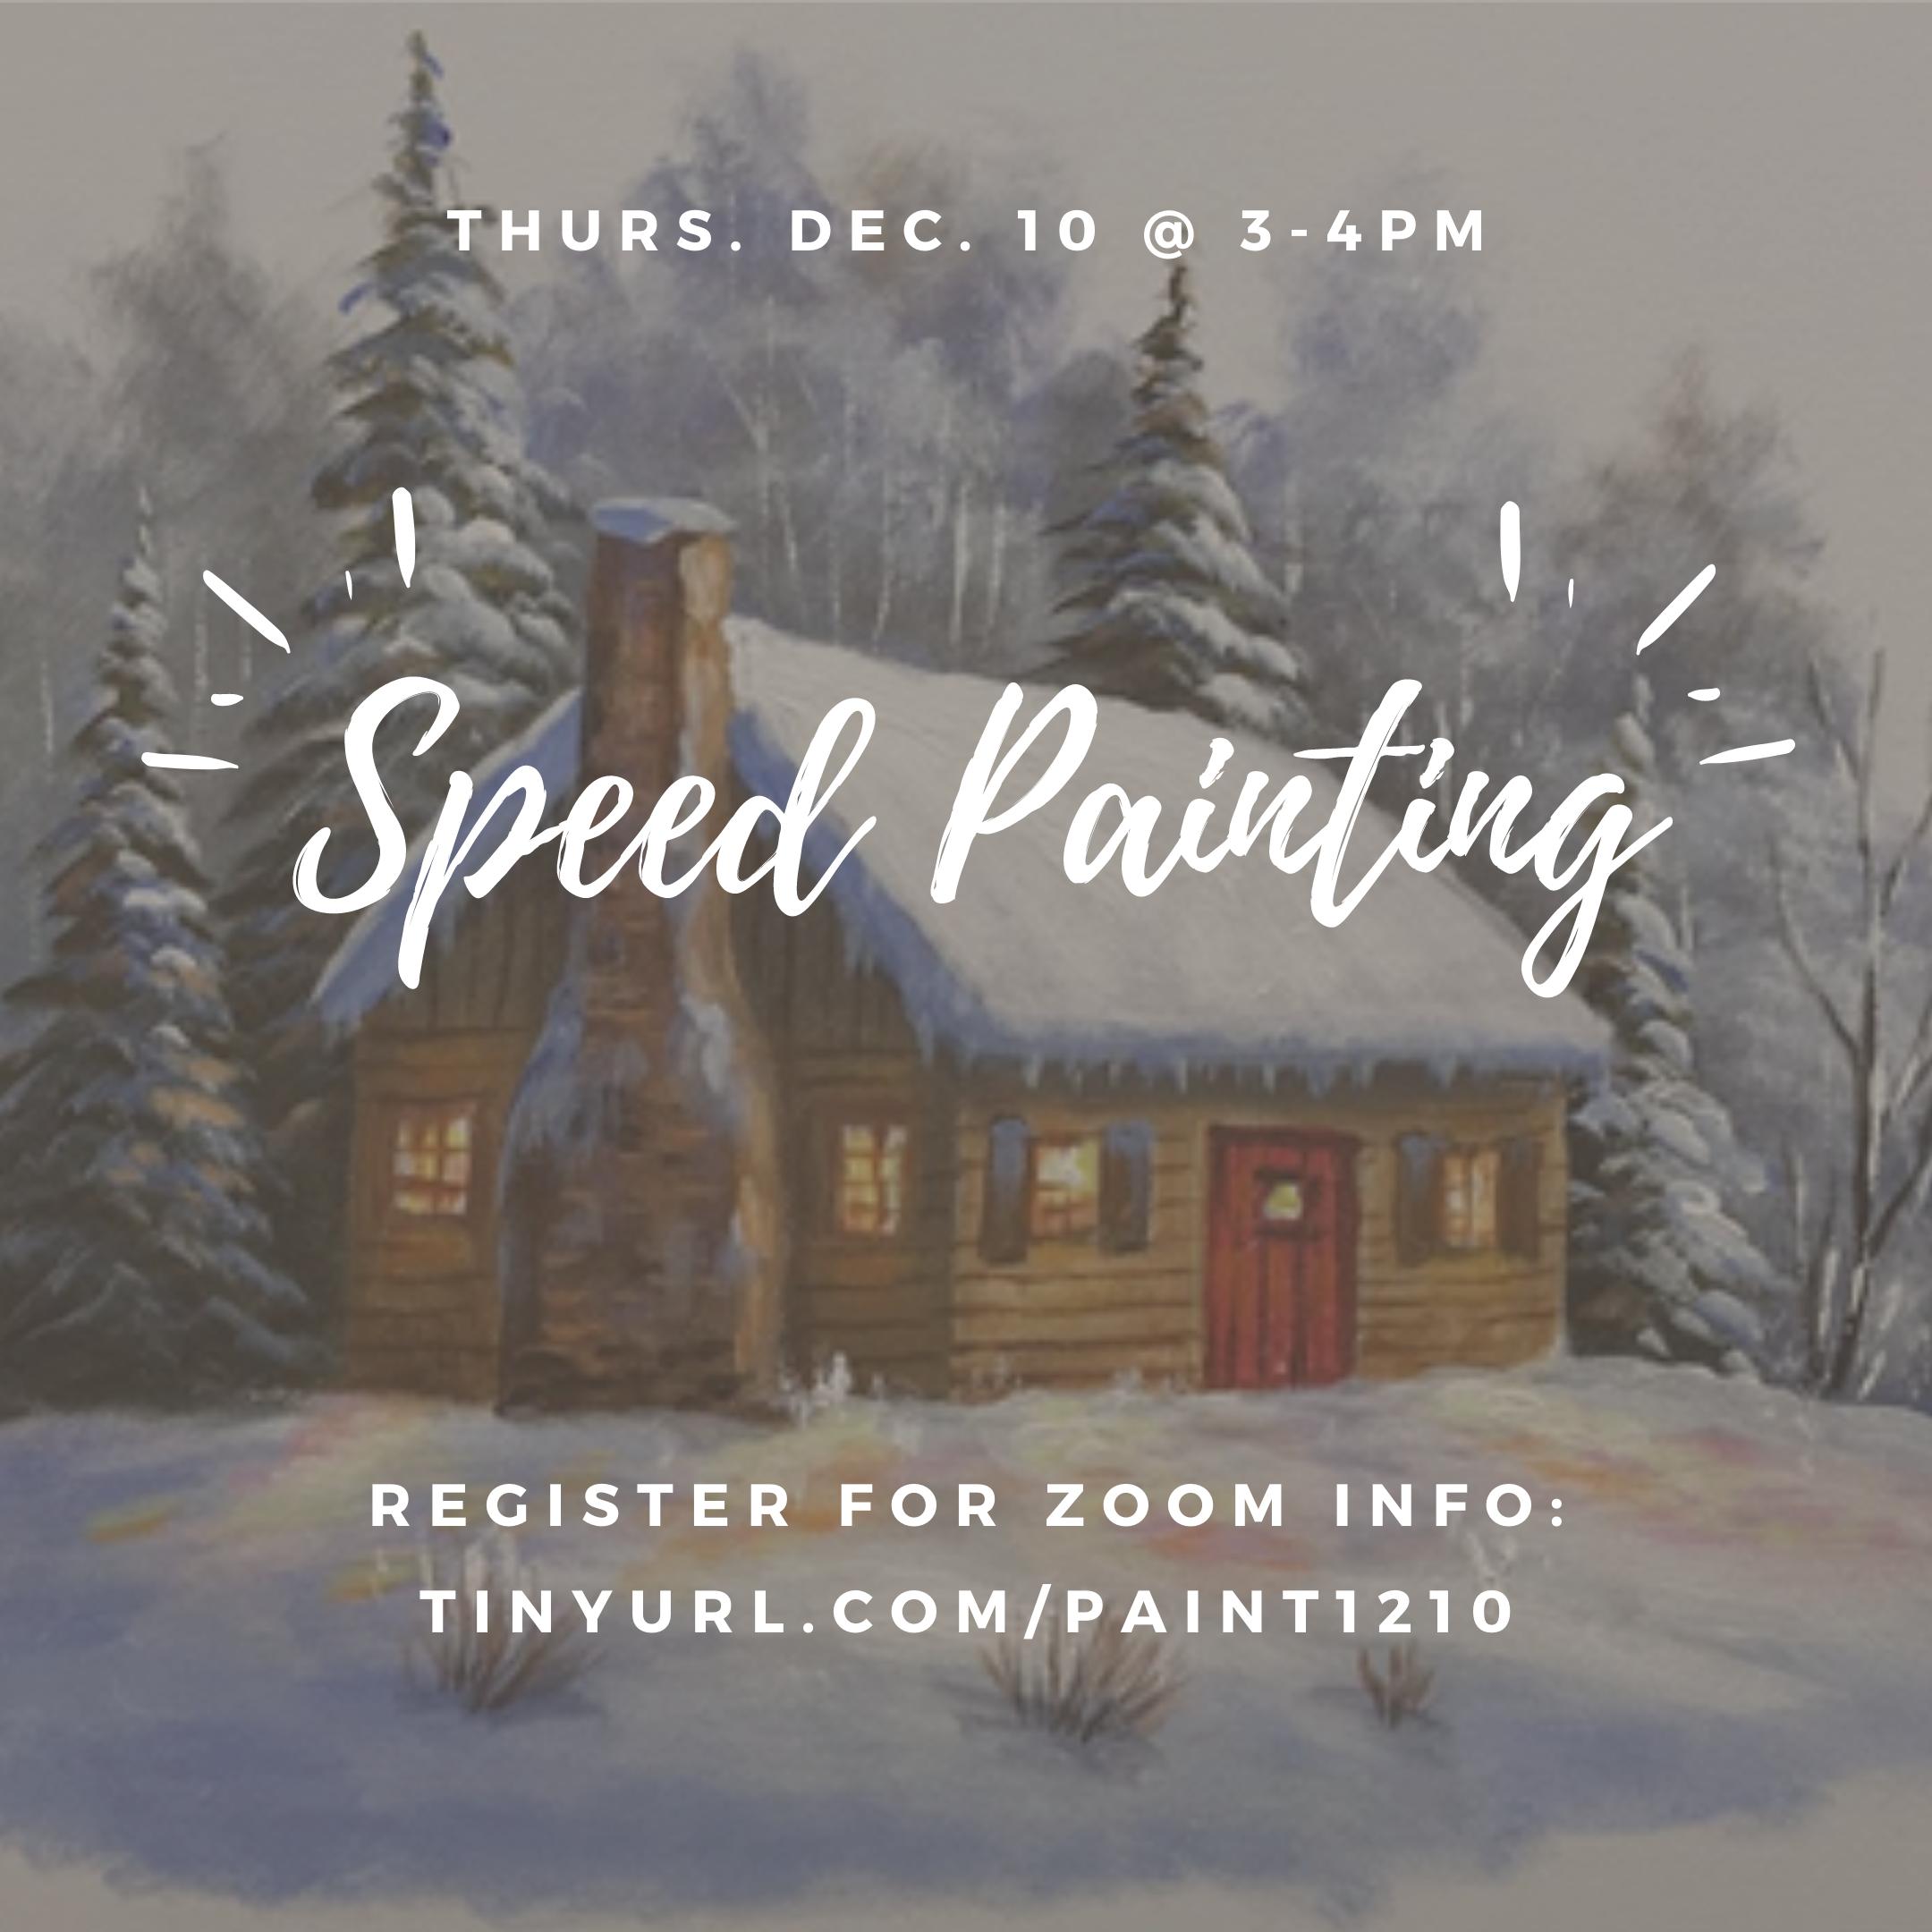 Speed Painting @ Zoom Meeting ID: 913 1095 7244